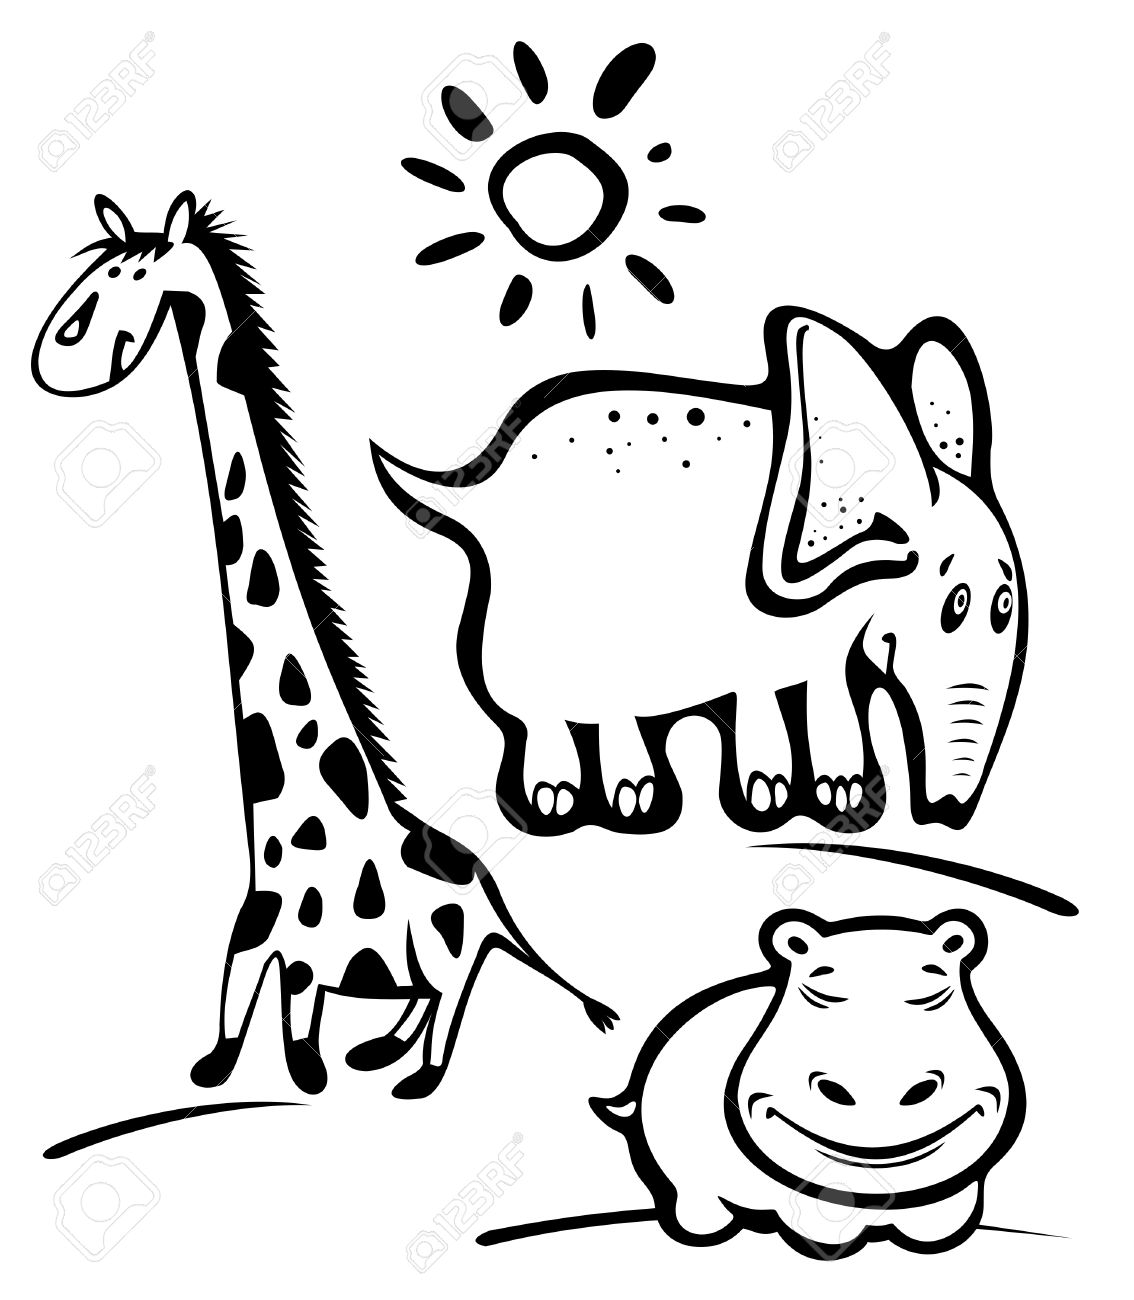 Cartoon wild animals: giraffe, elephant, hippopotamus isolated on a white background. Stock Vector - 5516132